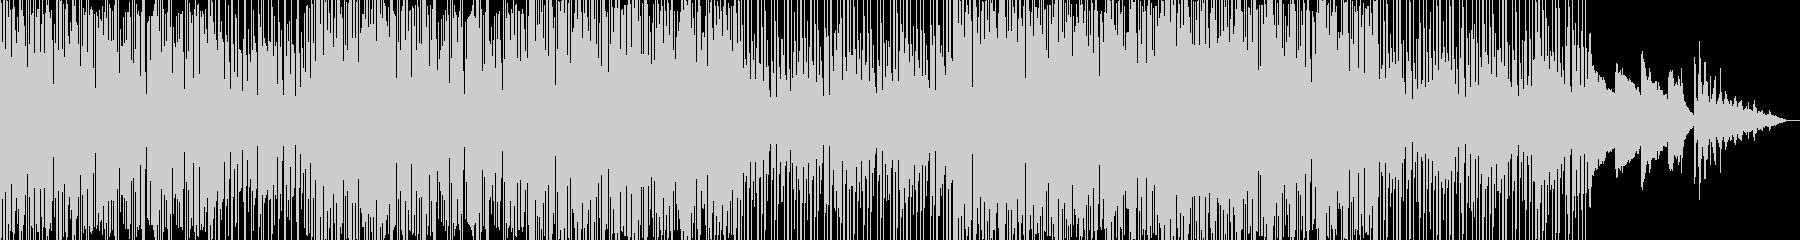 【CM】疾走感溢れるフューチャーハウスの未再生の波形